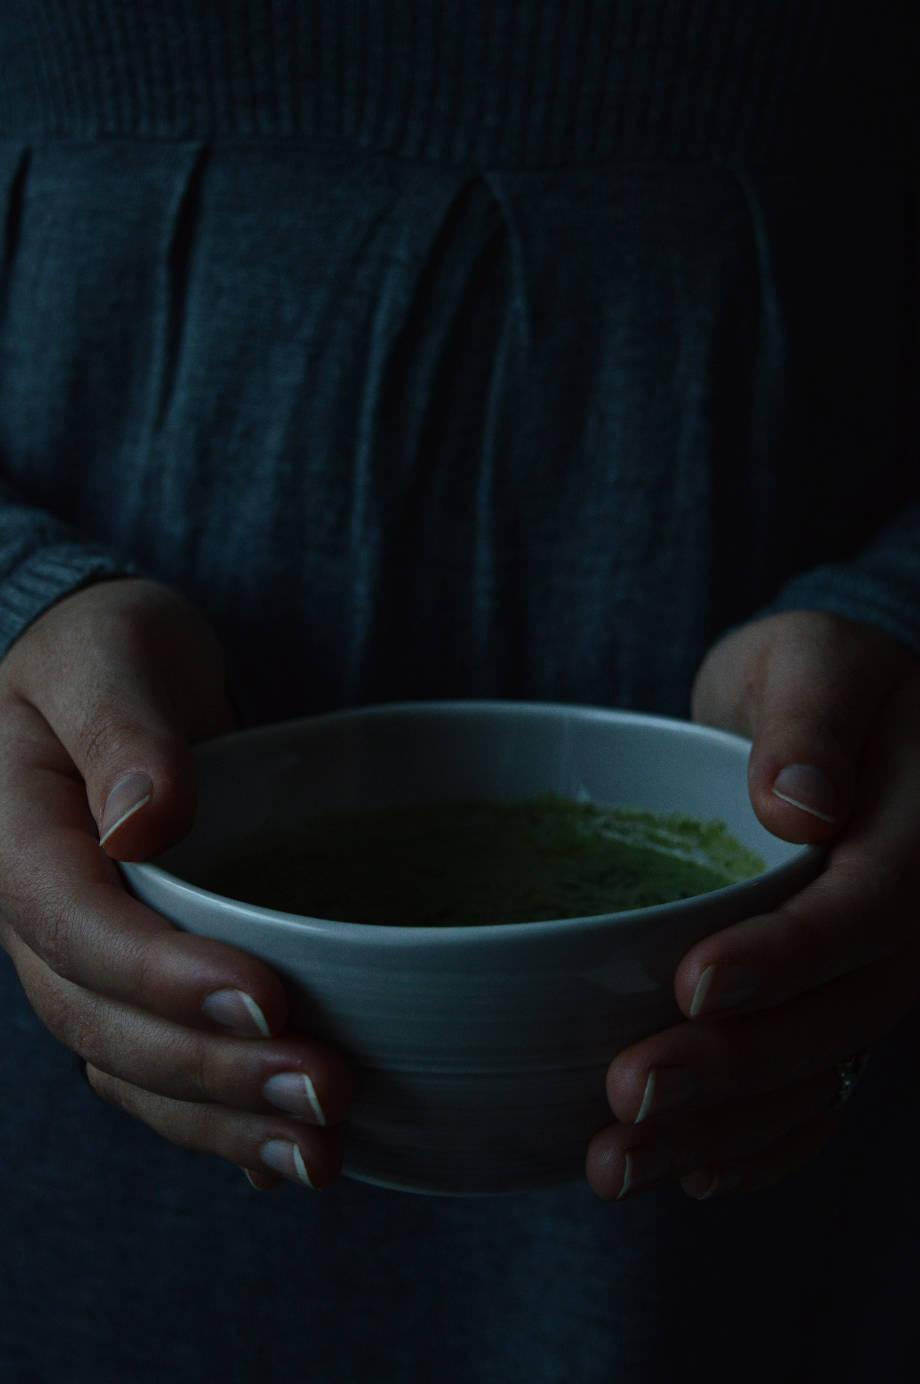 Nettle soup recipe in Pentik ceramics